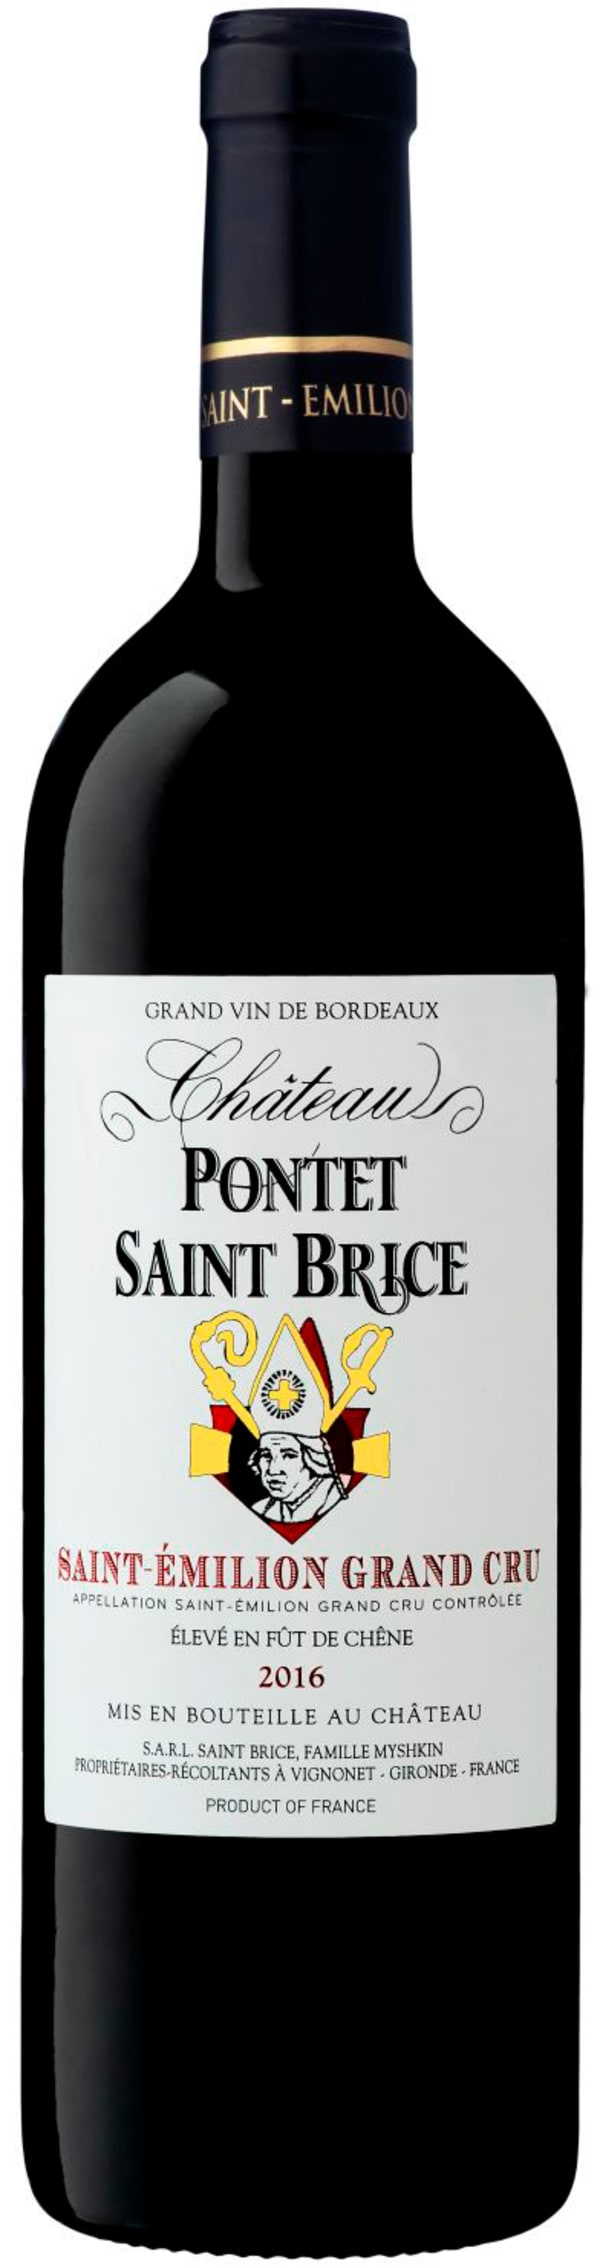 Chateau Pontet Saint Brice 2016